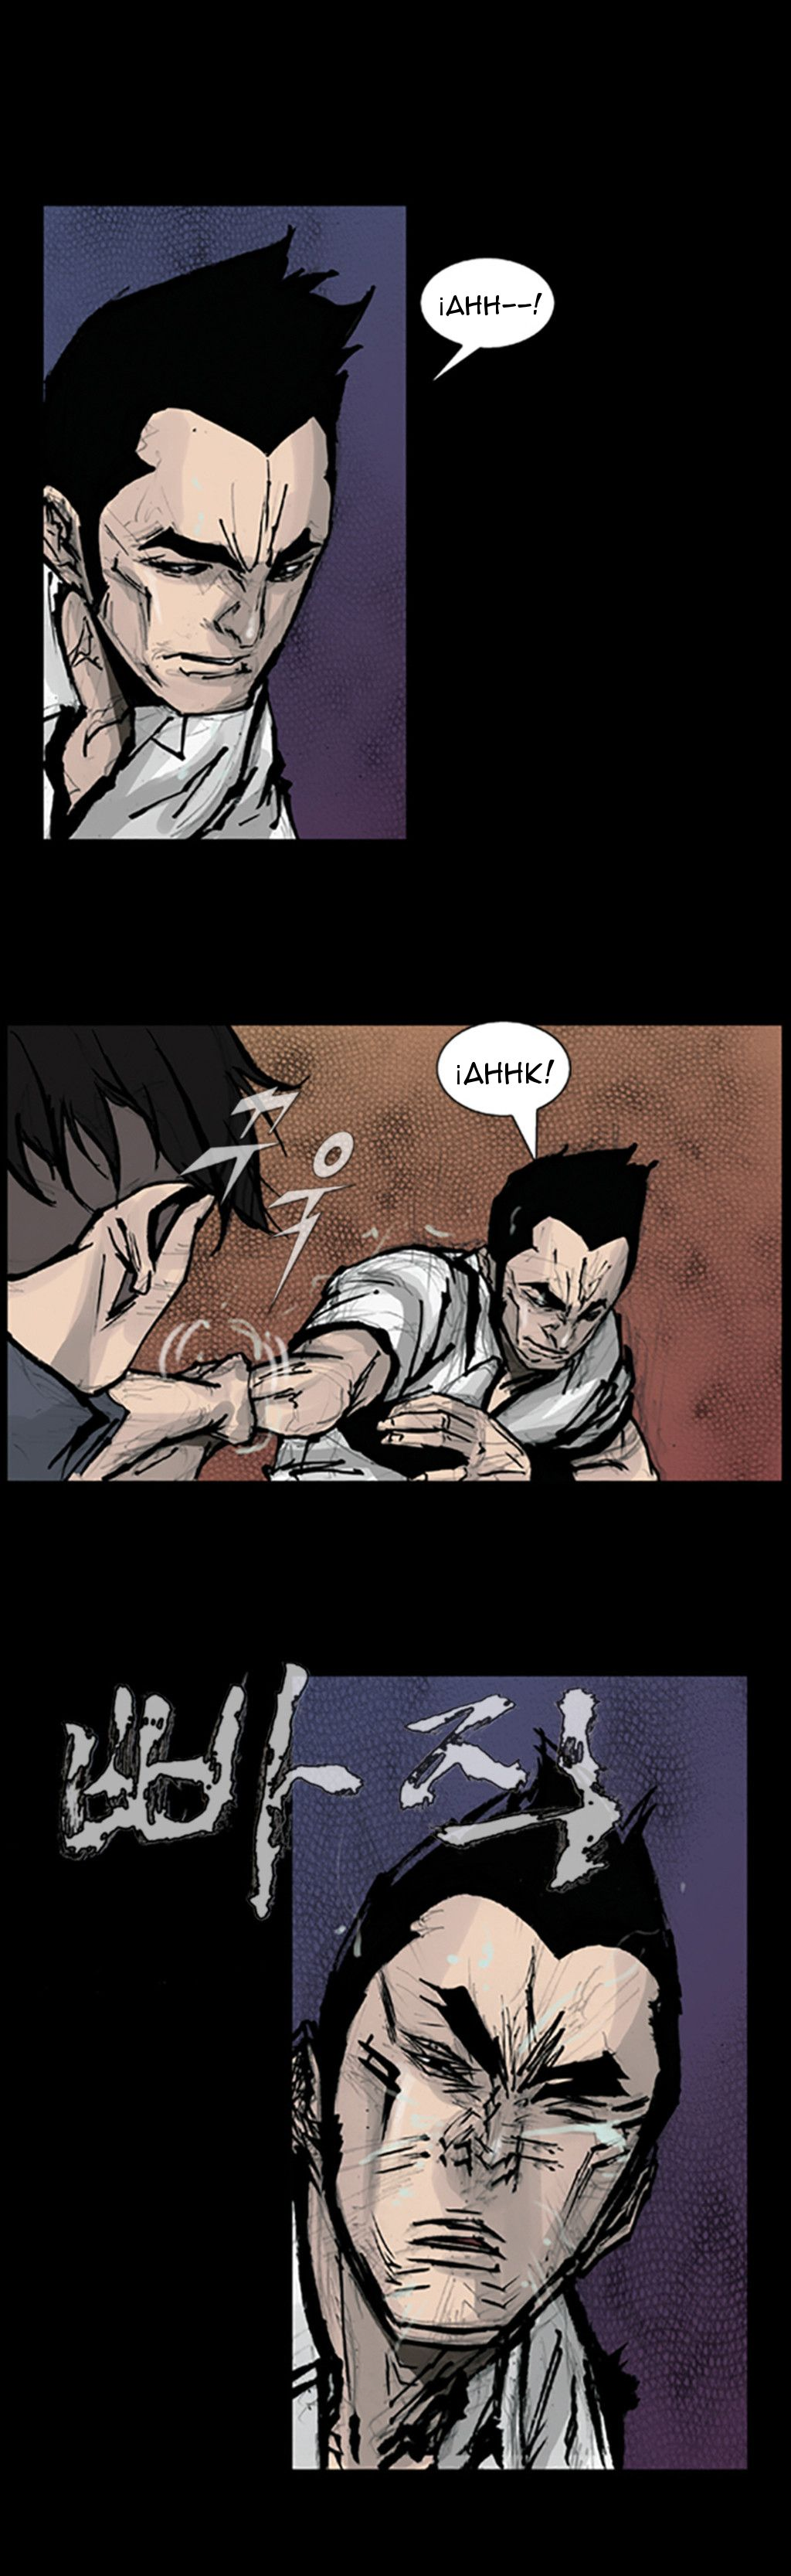 https://c9.mangatag.com/es_manga/pic5/41/20009/739421/56535b943d33605c7231405ac564d698.jpg Page 2